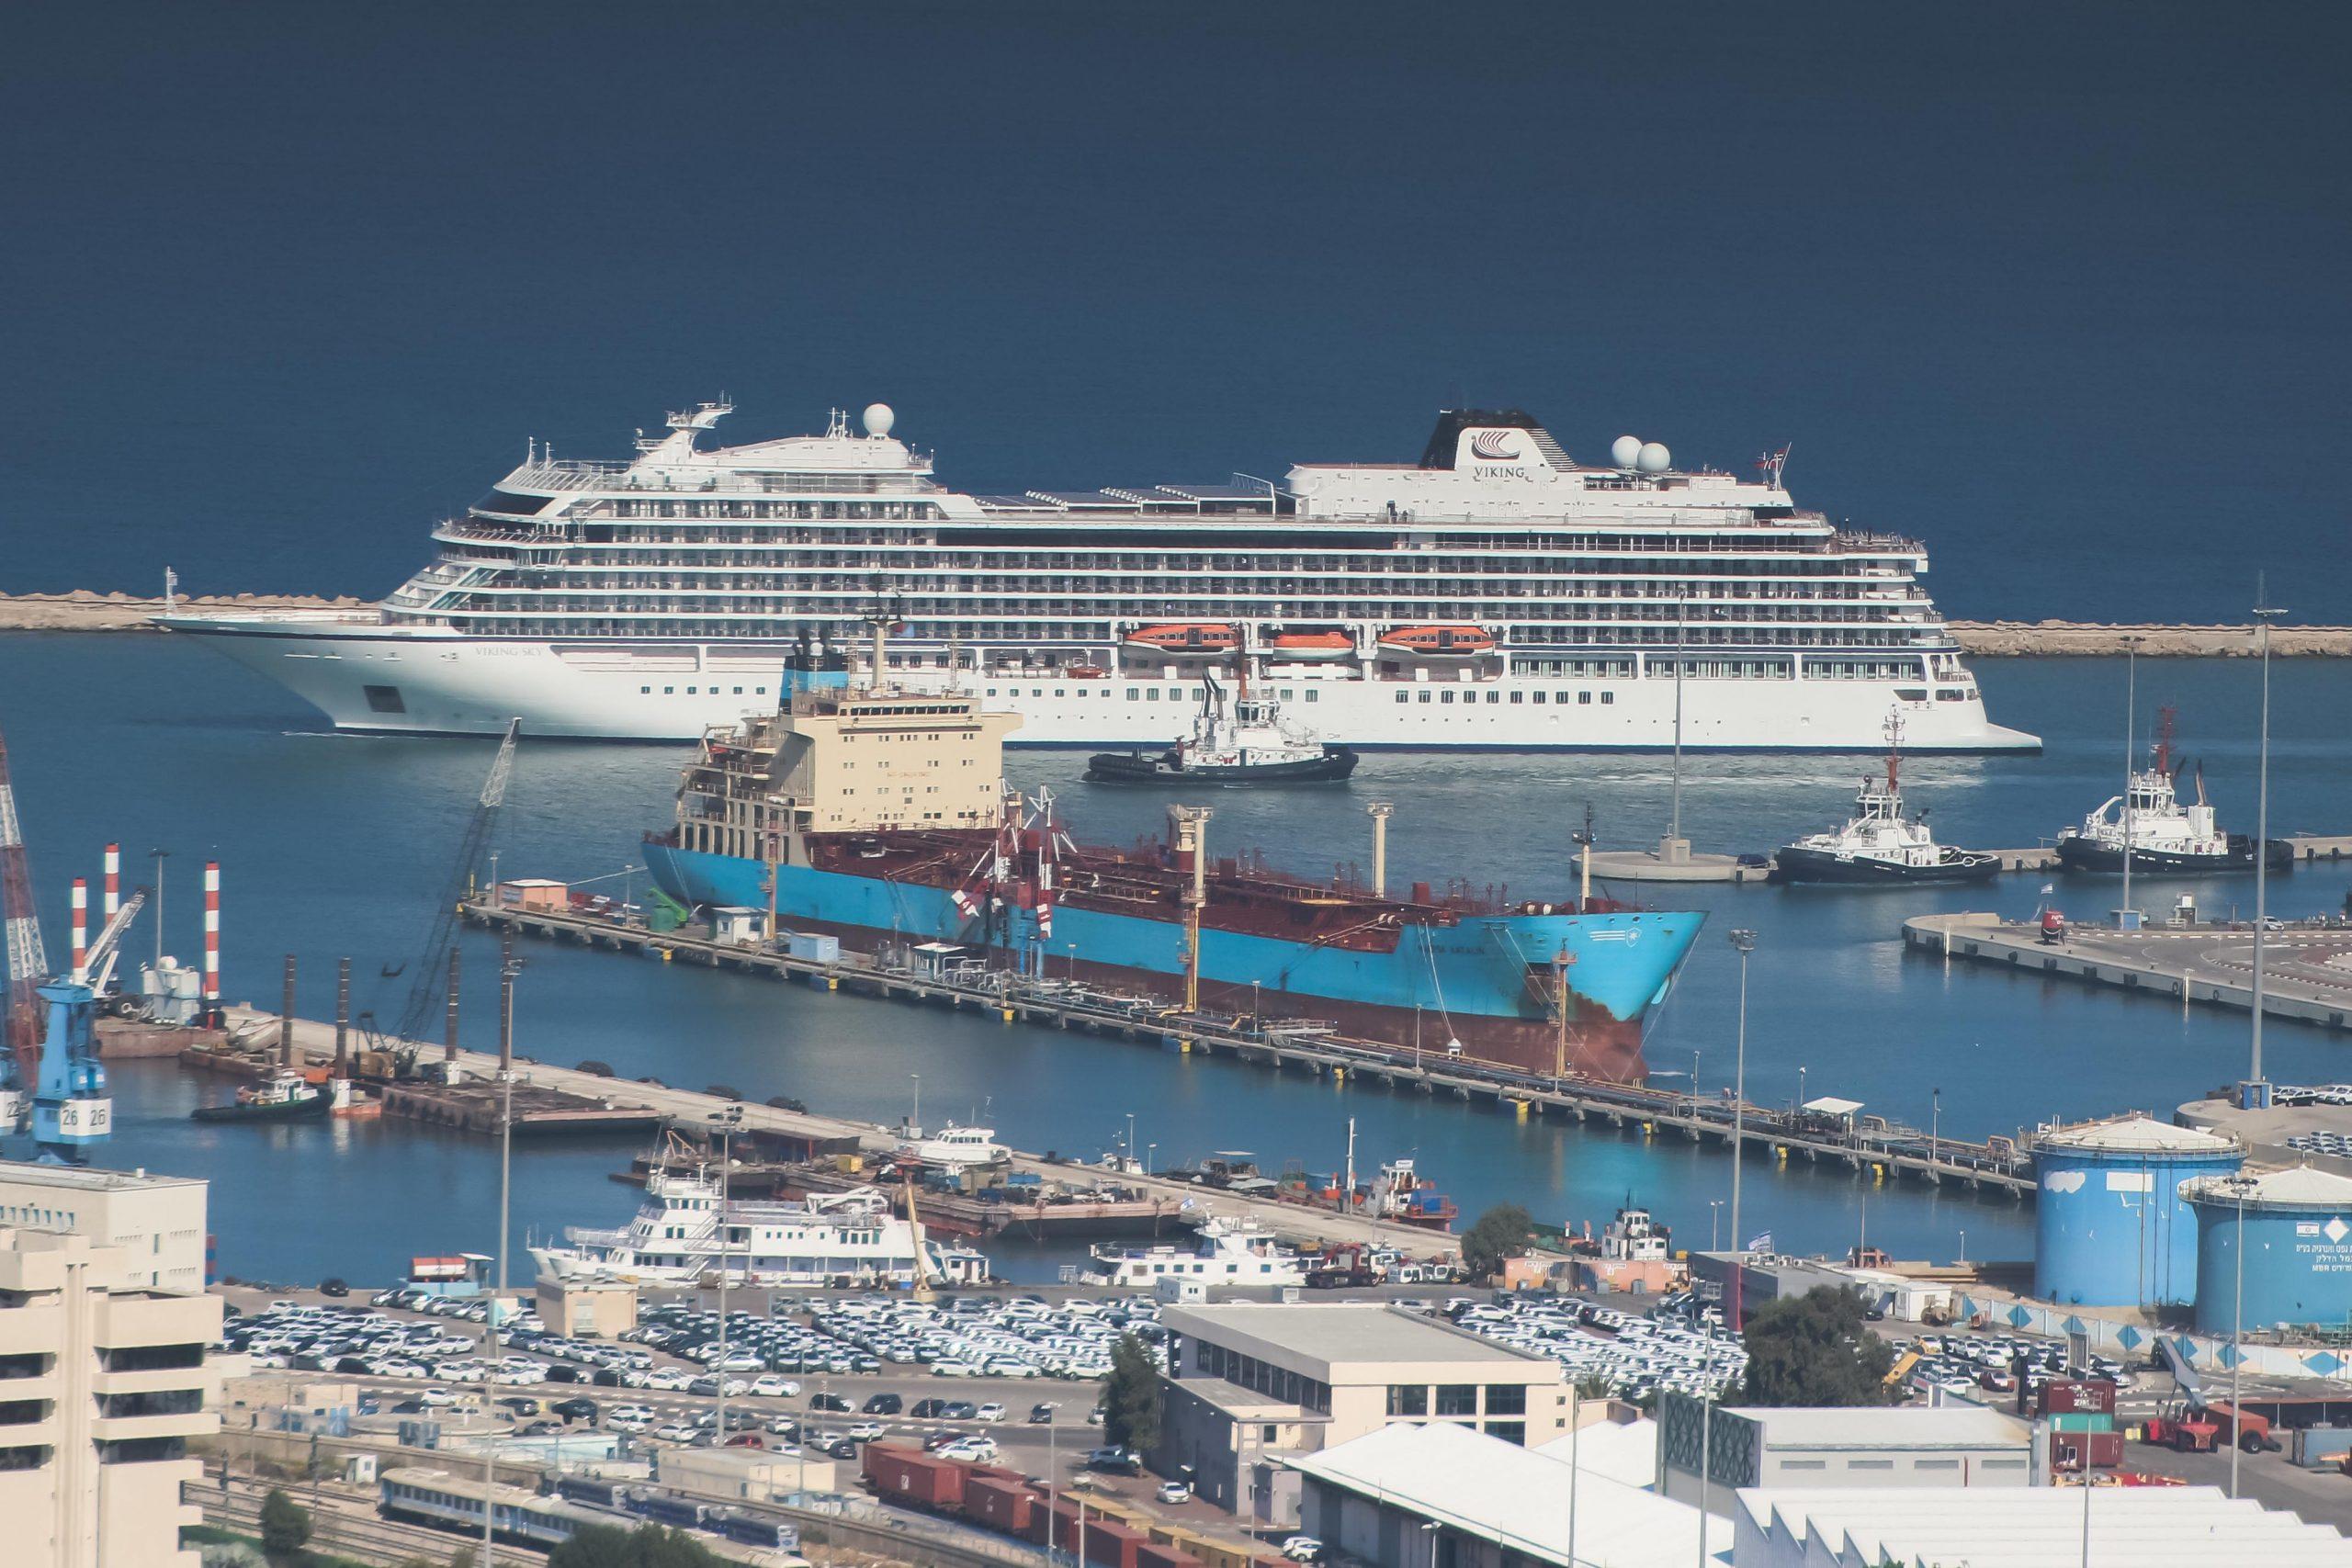 Cruise ship Viking Sky on Mediterranean cruise